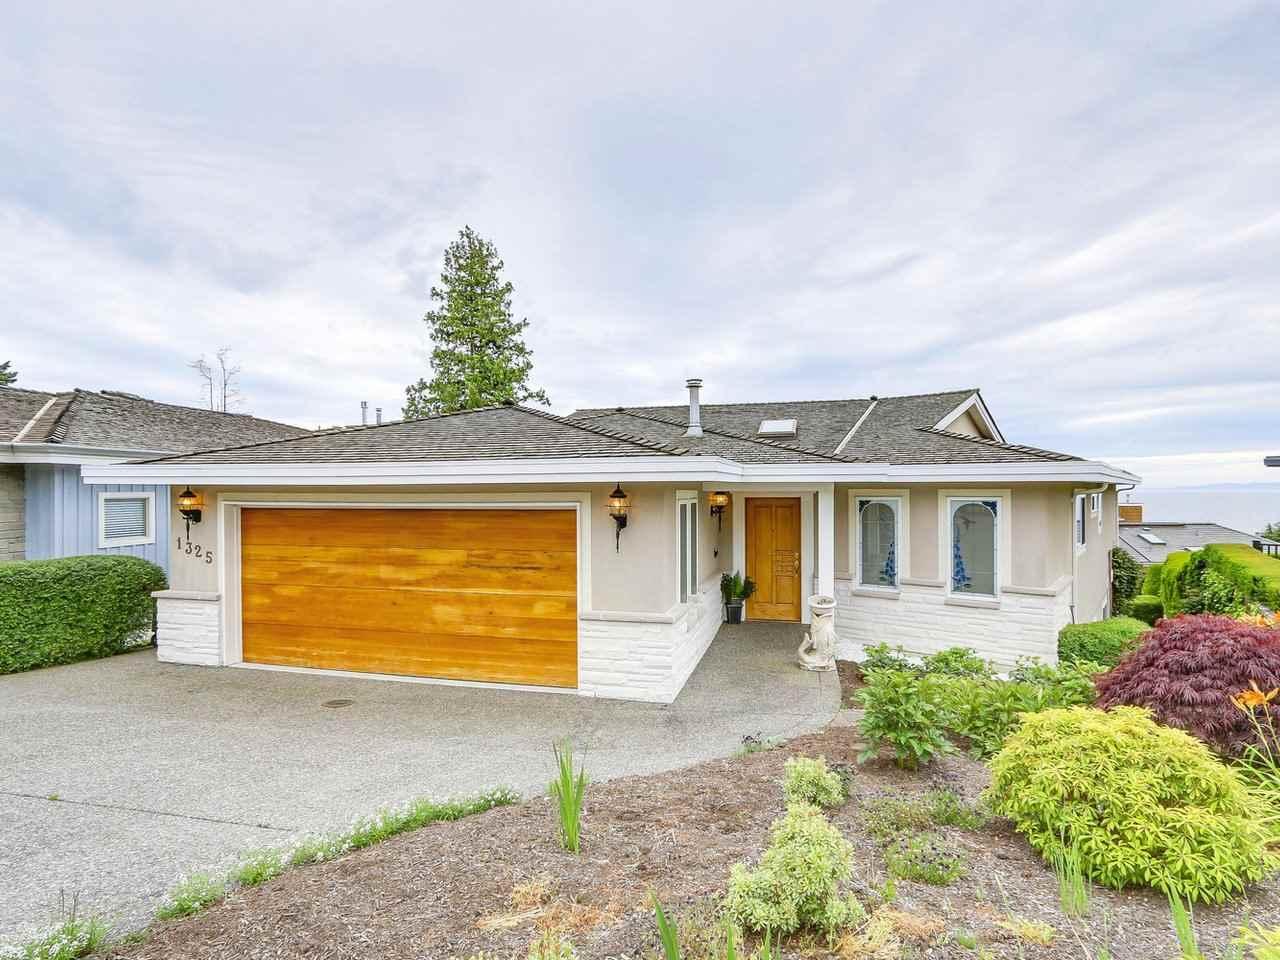 Detached at 1325 132B STREET, South Surrey White Rock, British Columbia. Image 1